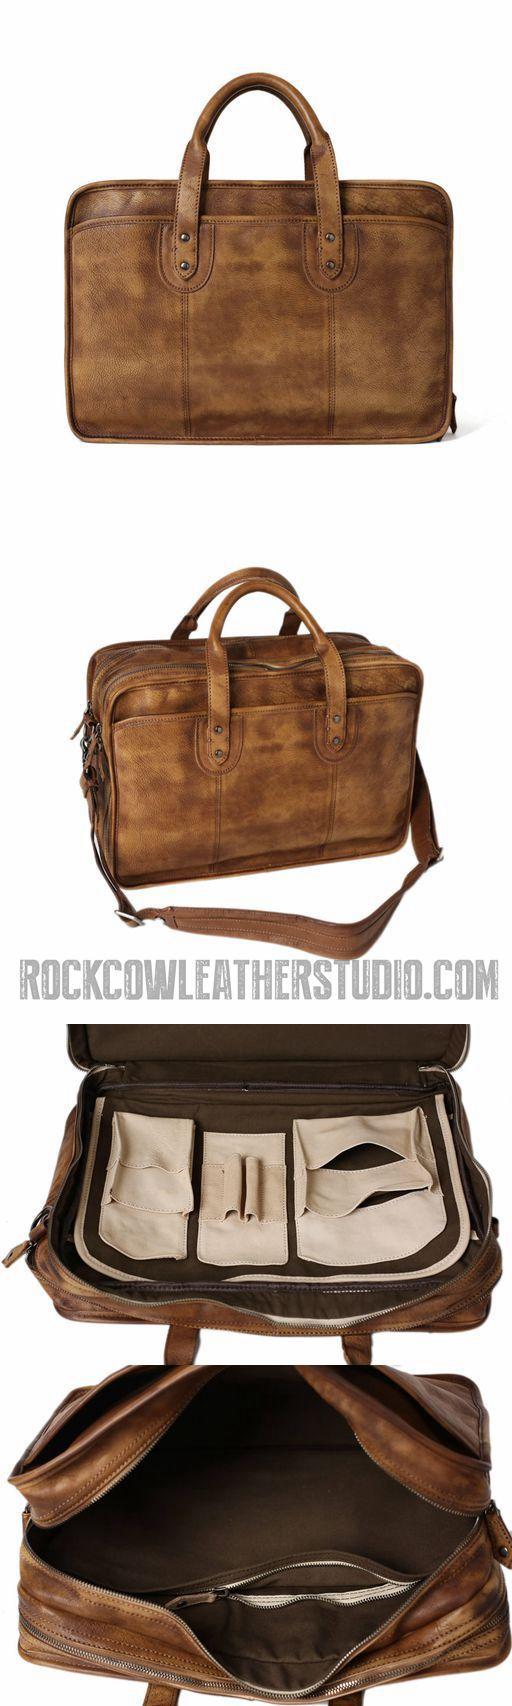 Vintage Full Grain Leather Men Briefcase, 16'' Laptop Bag, Handmade Business Handbag NZ01